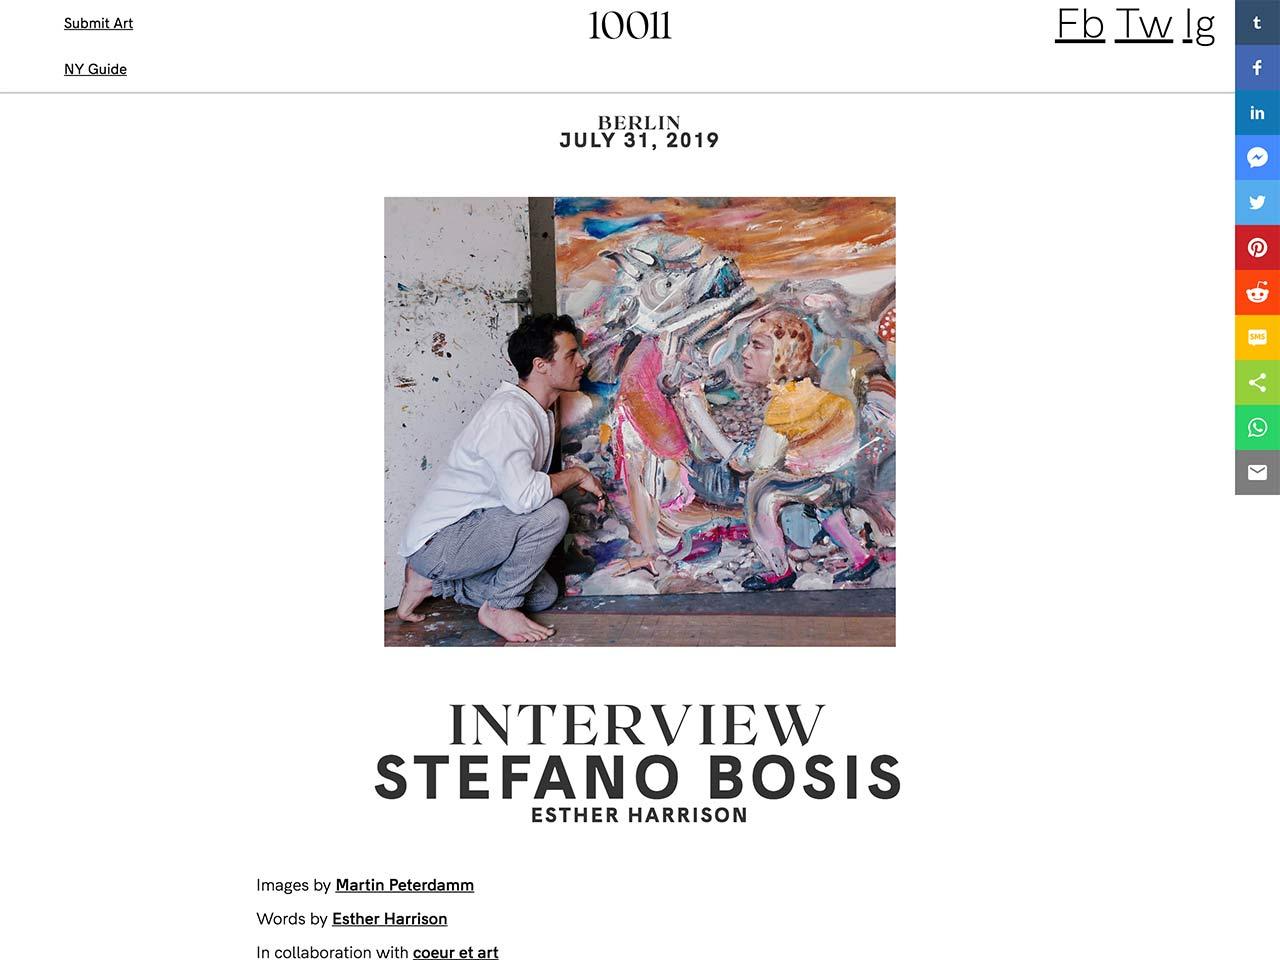 Artist Portrait, Artist Portrait of the Painter Stefano Bosis for 10011mag, Martin Peterdamm Photography